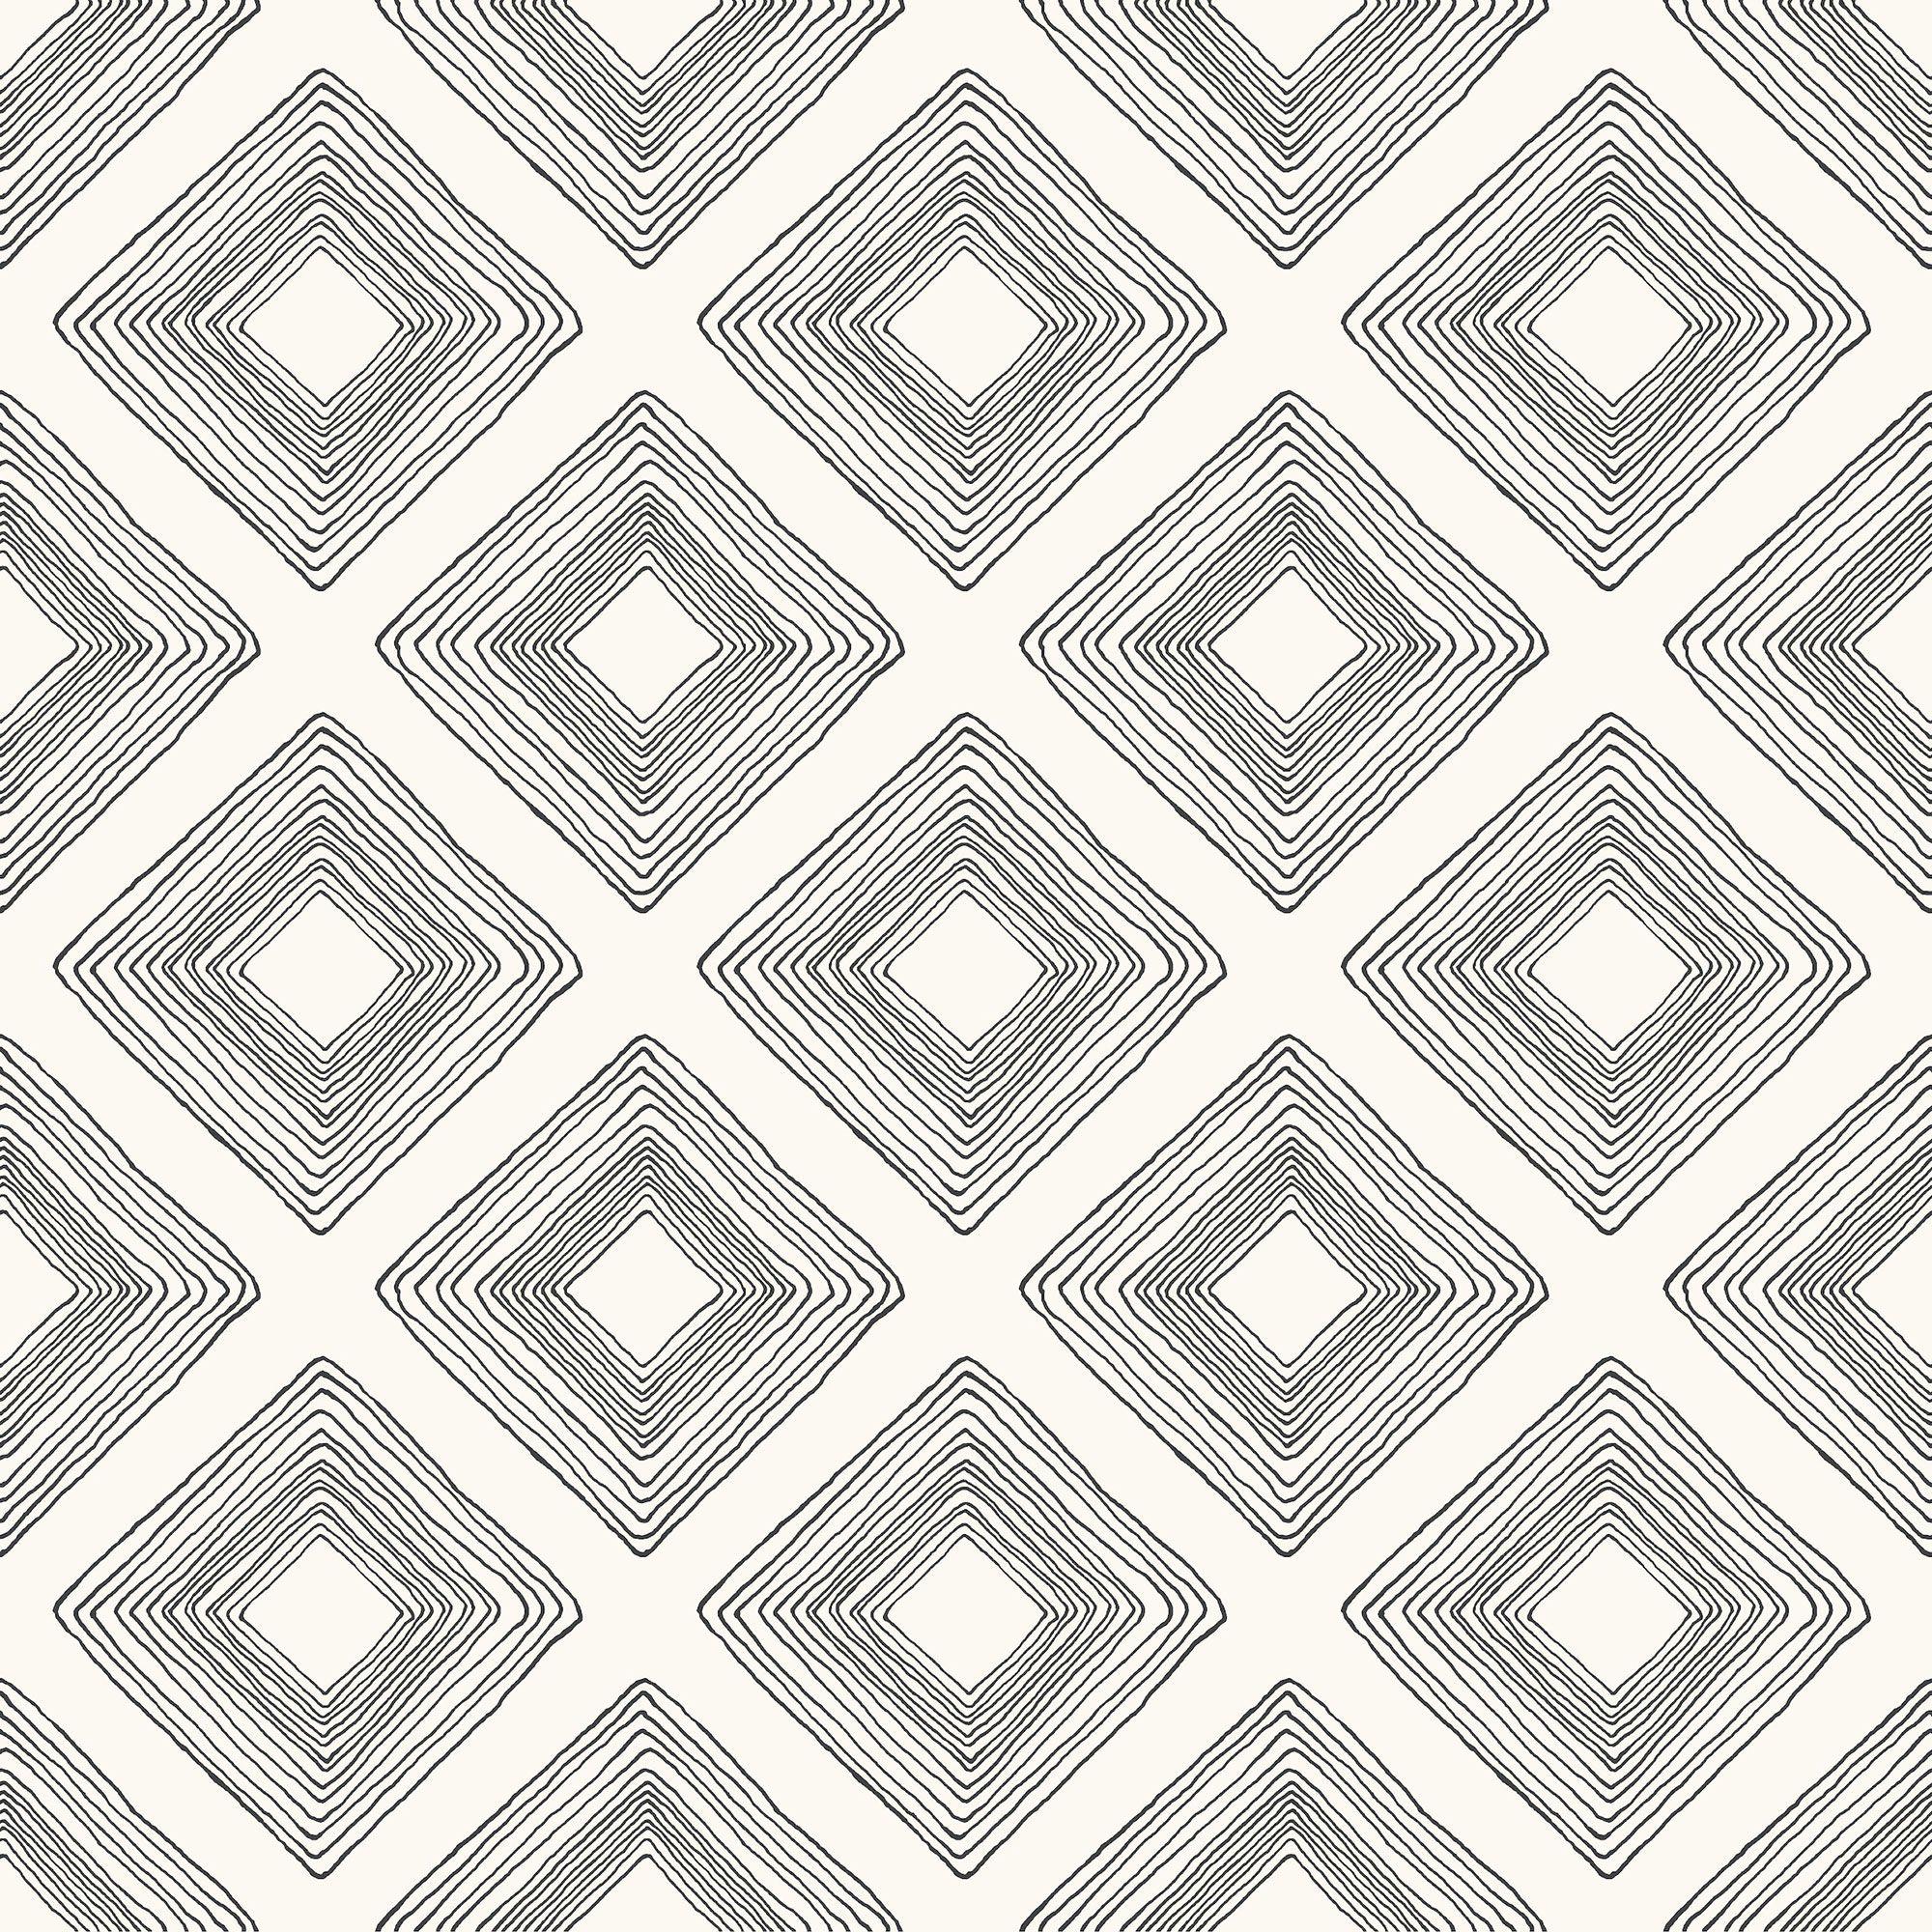 Magnolia Home Diamond Sketch Wallpaper Black & White